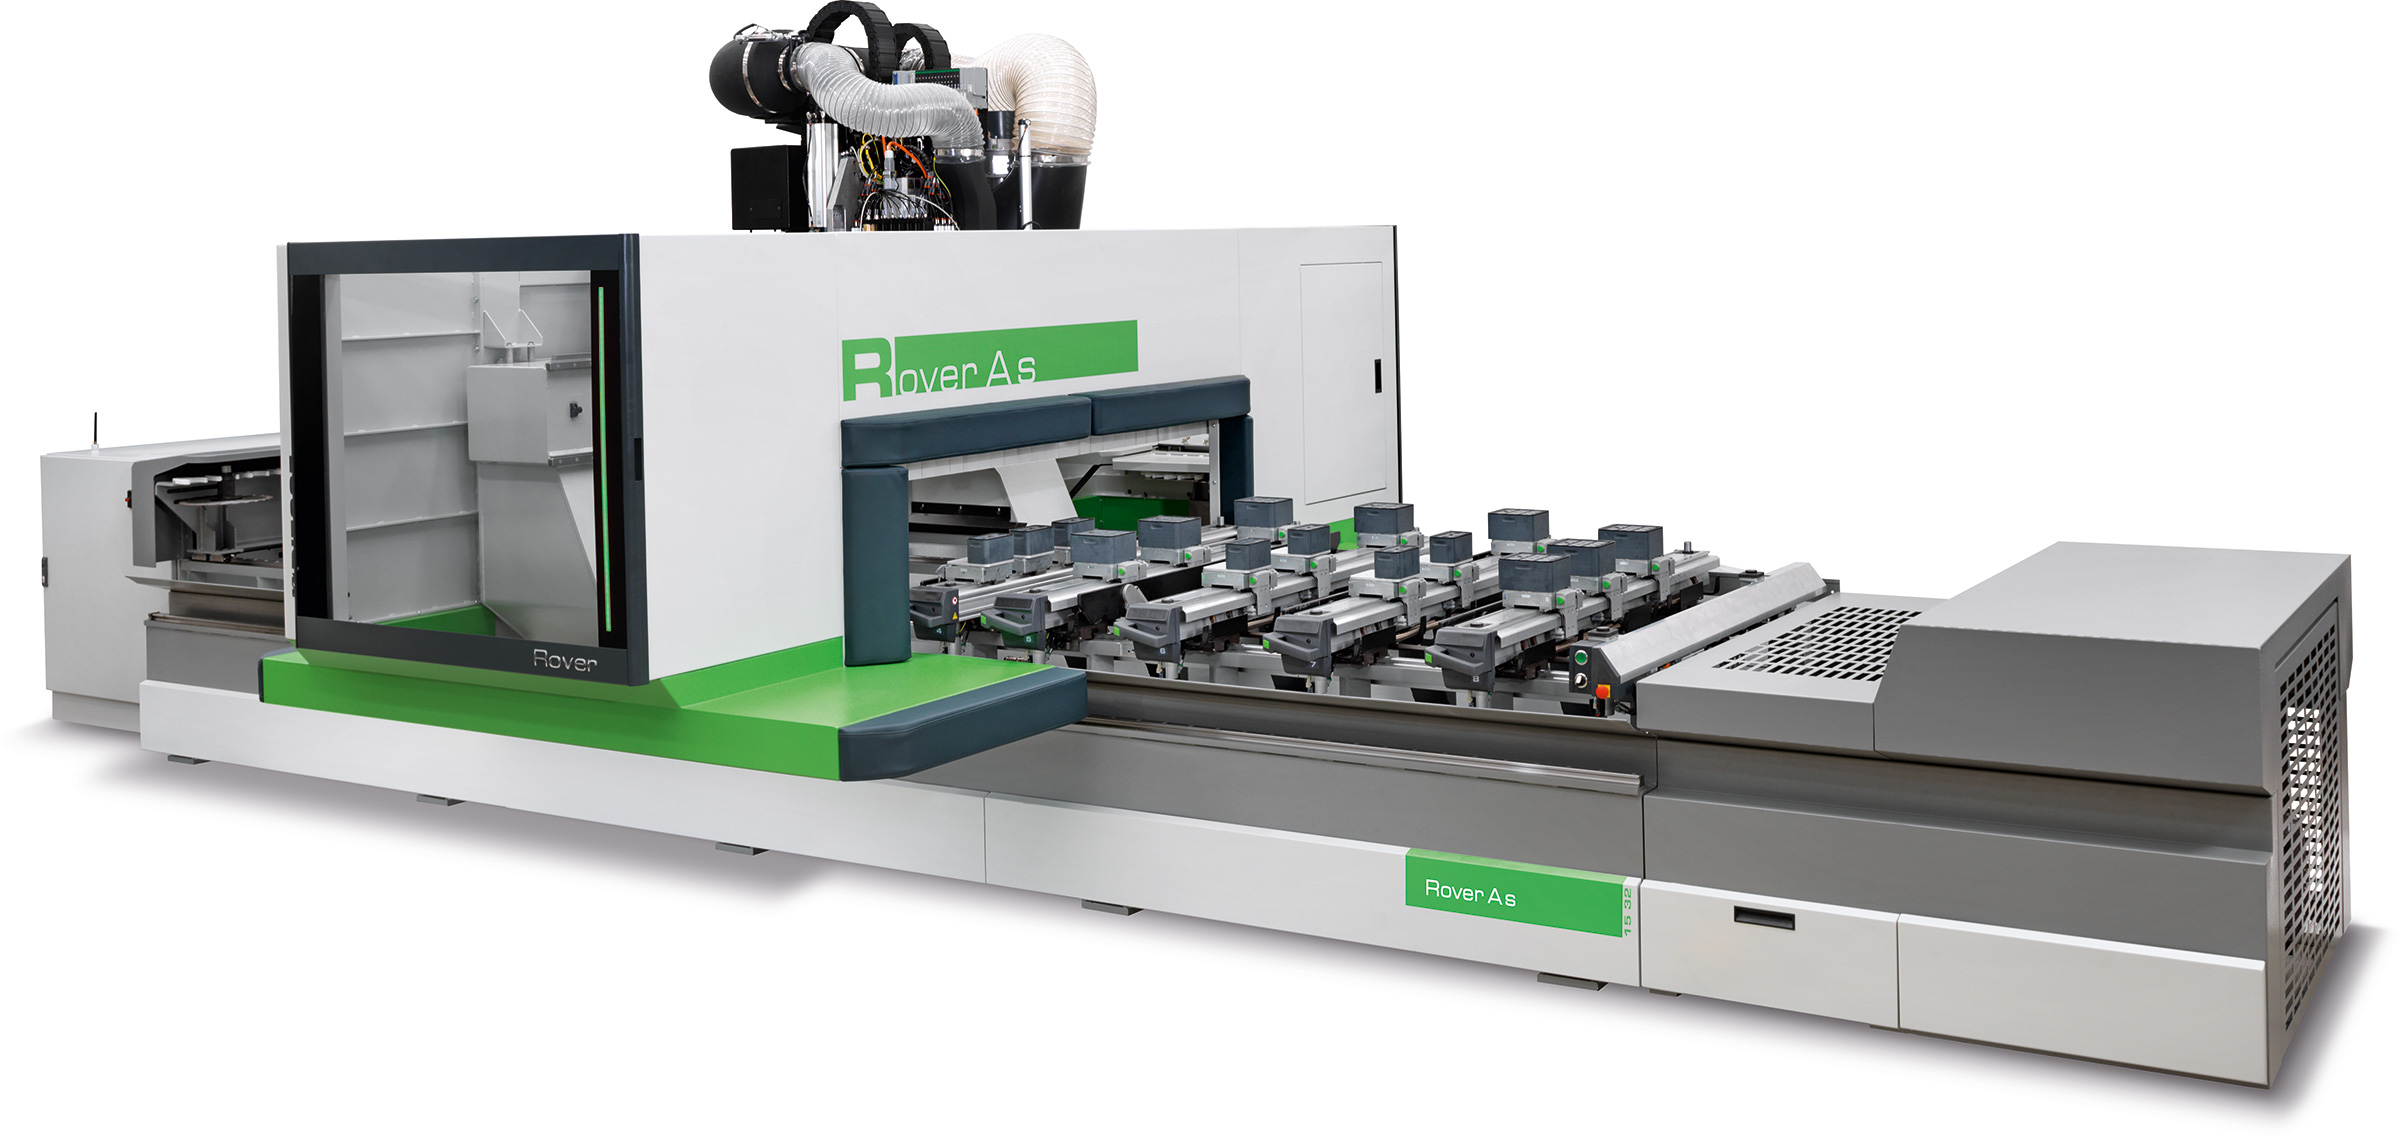 Biesse Rover AS 15 CNC freesmachine